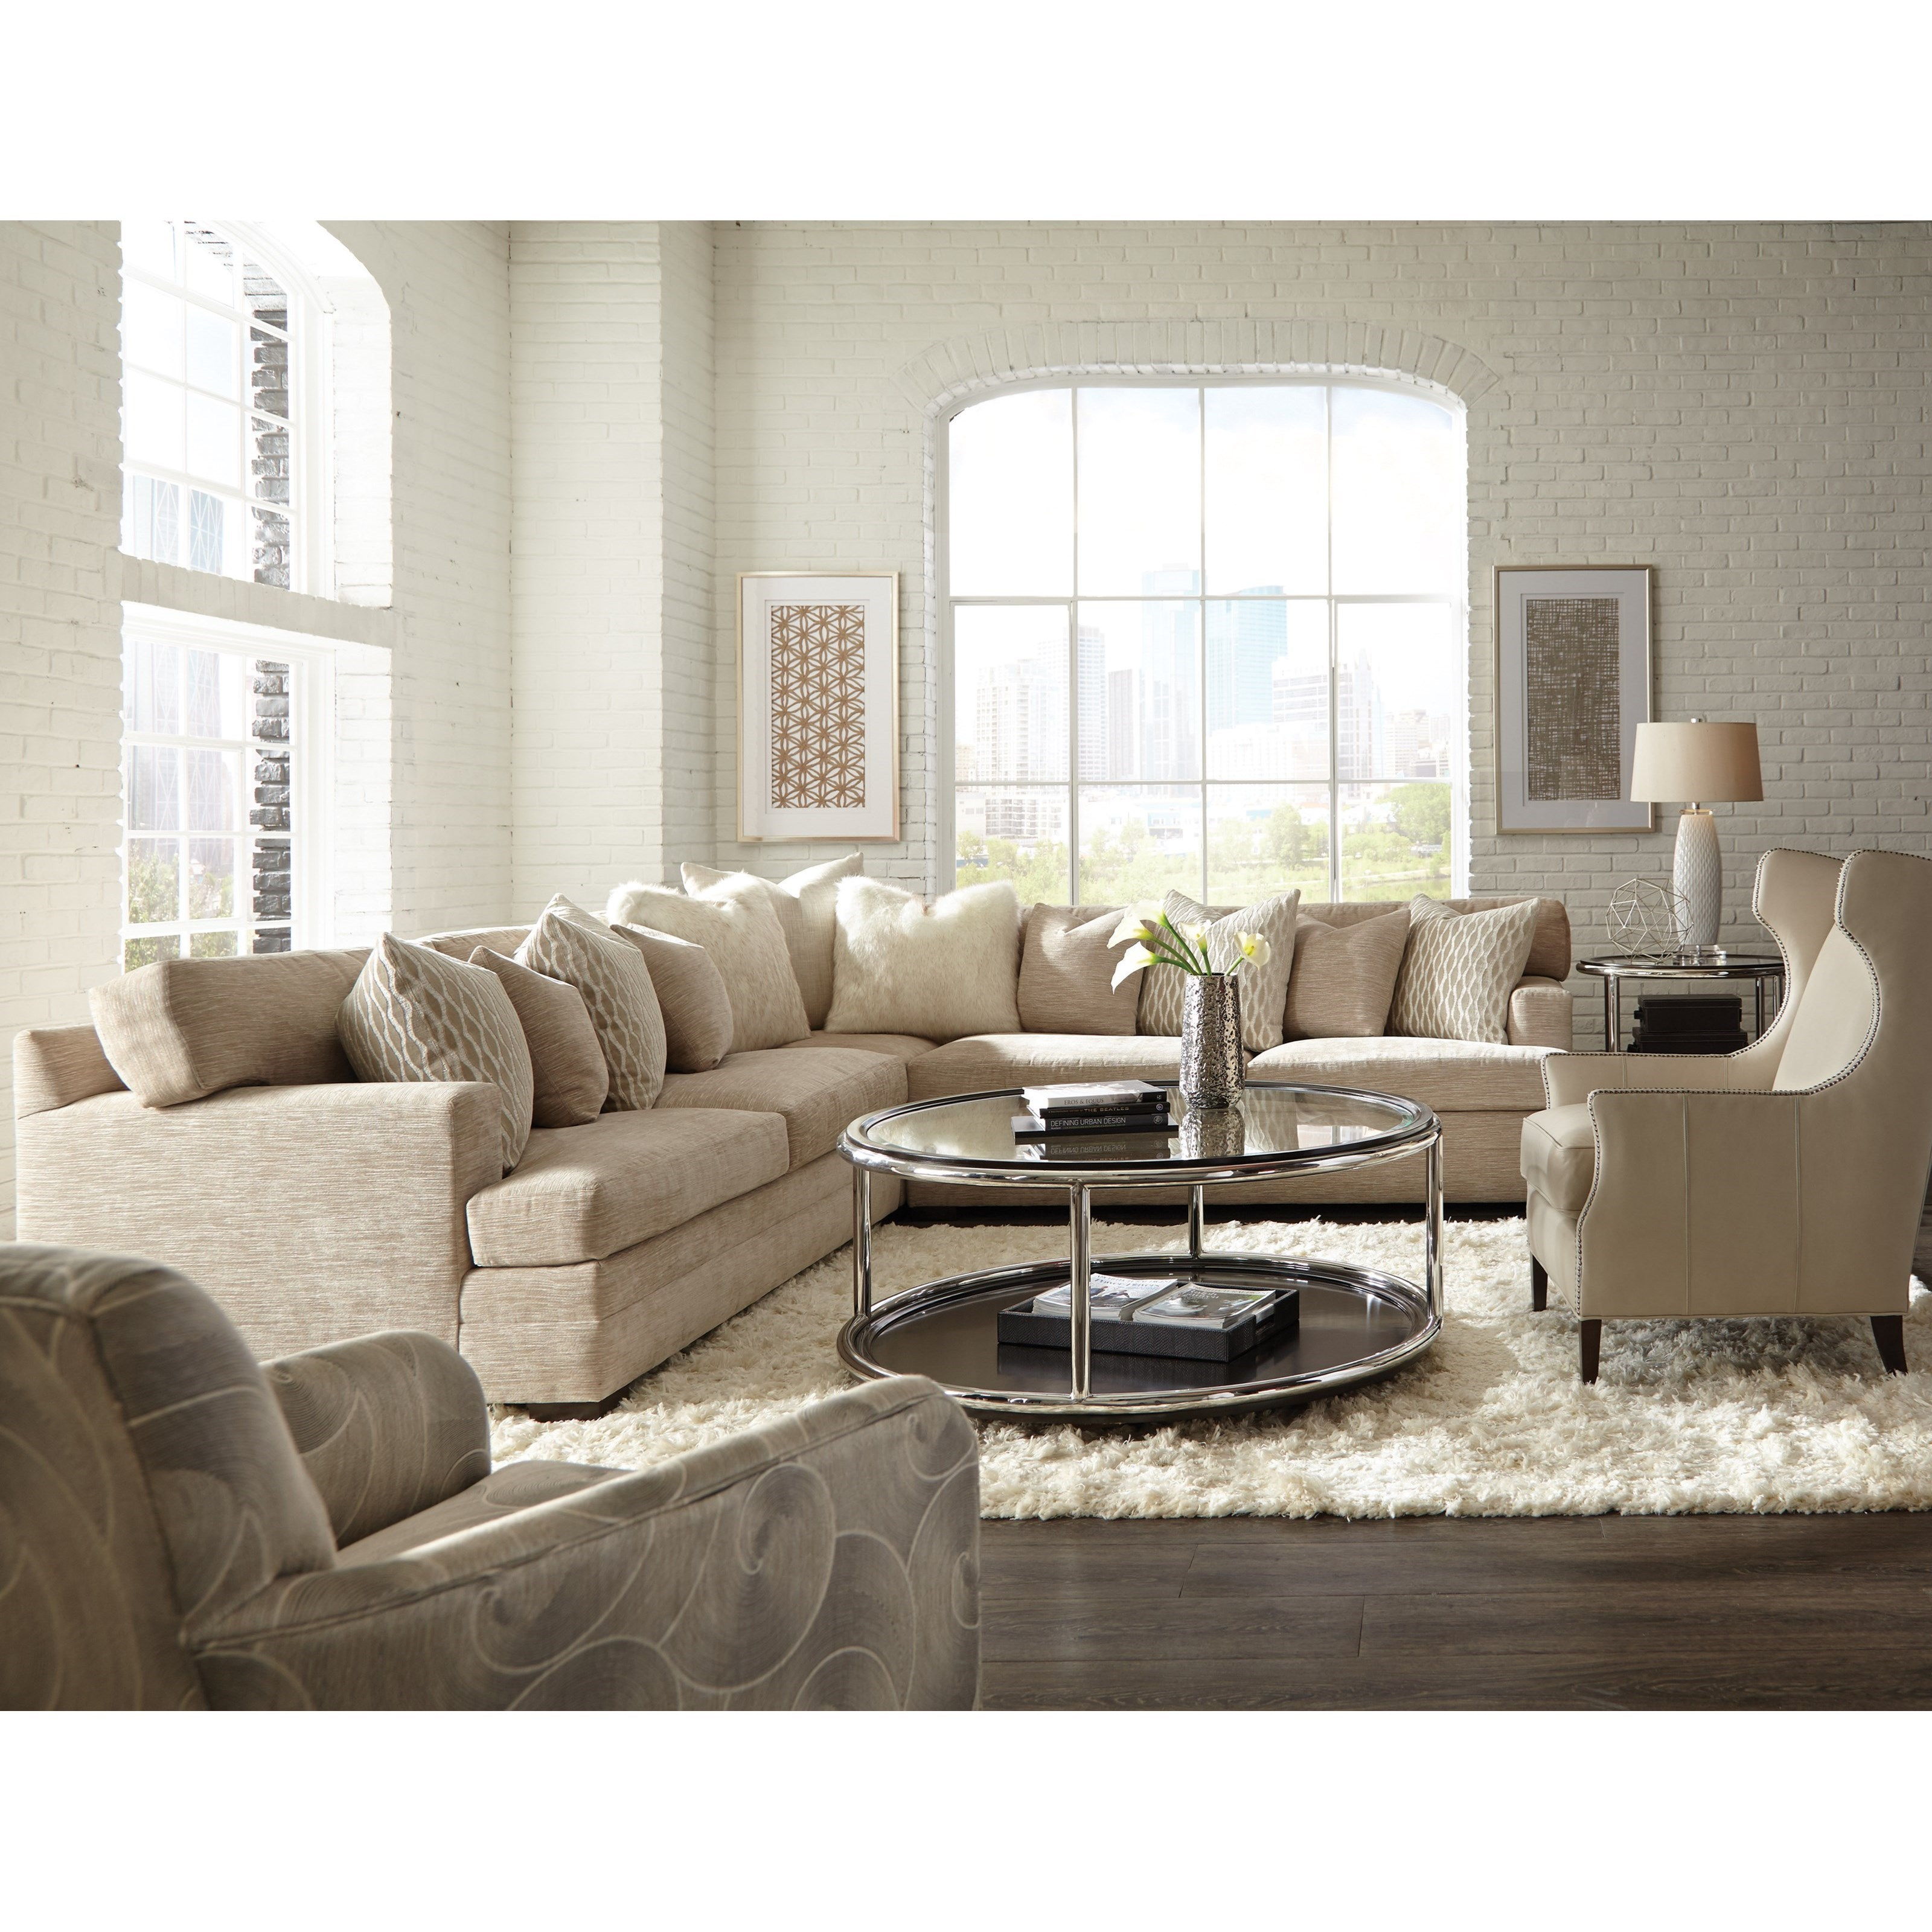 7100 Sectional by Geoffrey Alexander at Sprintz Furniture